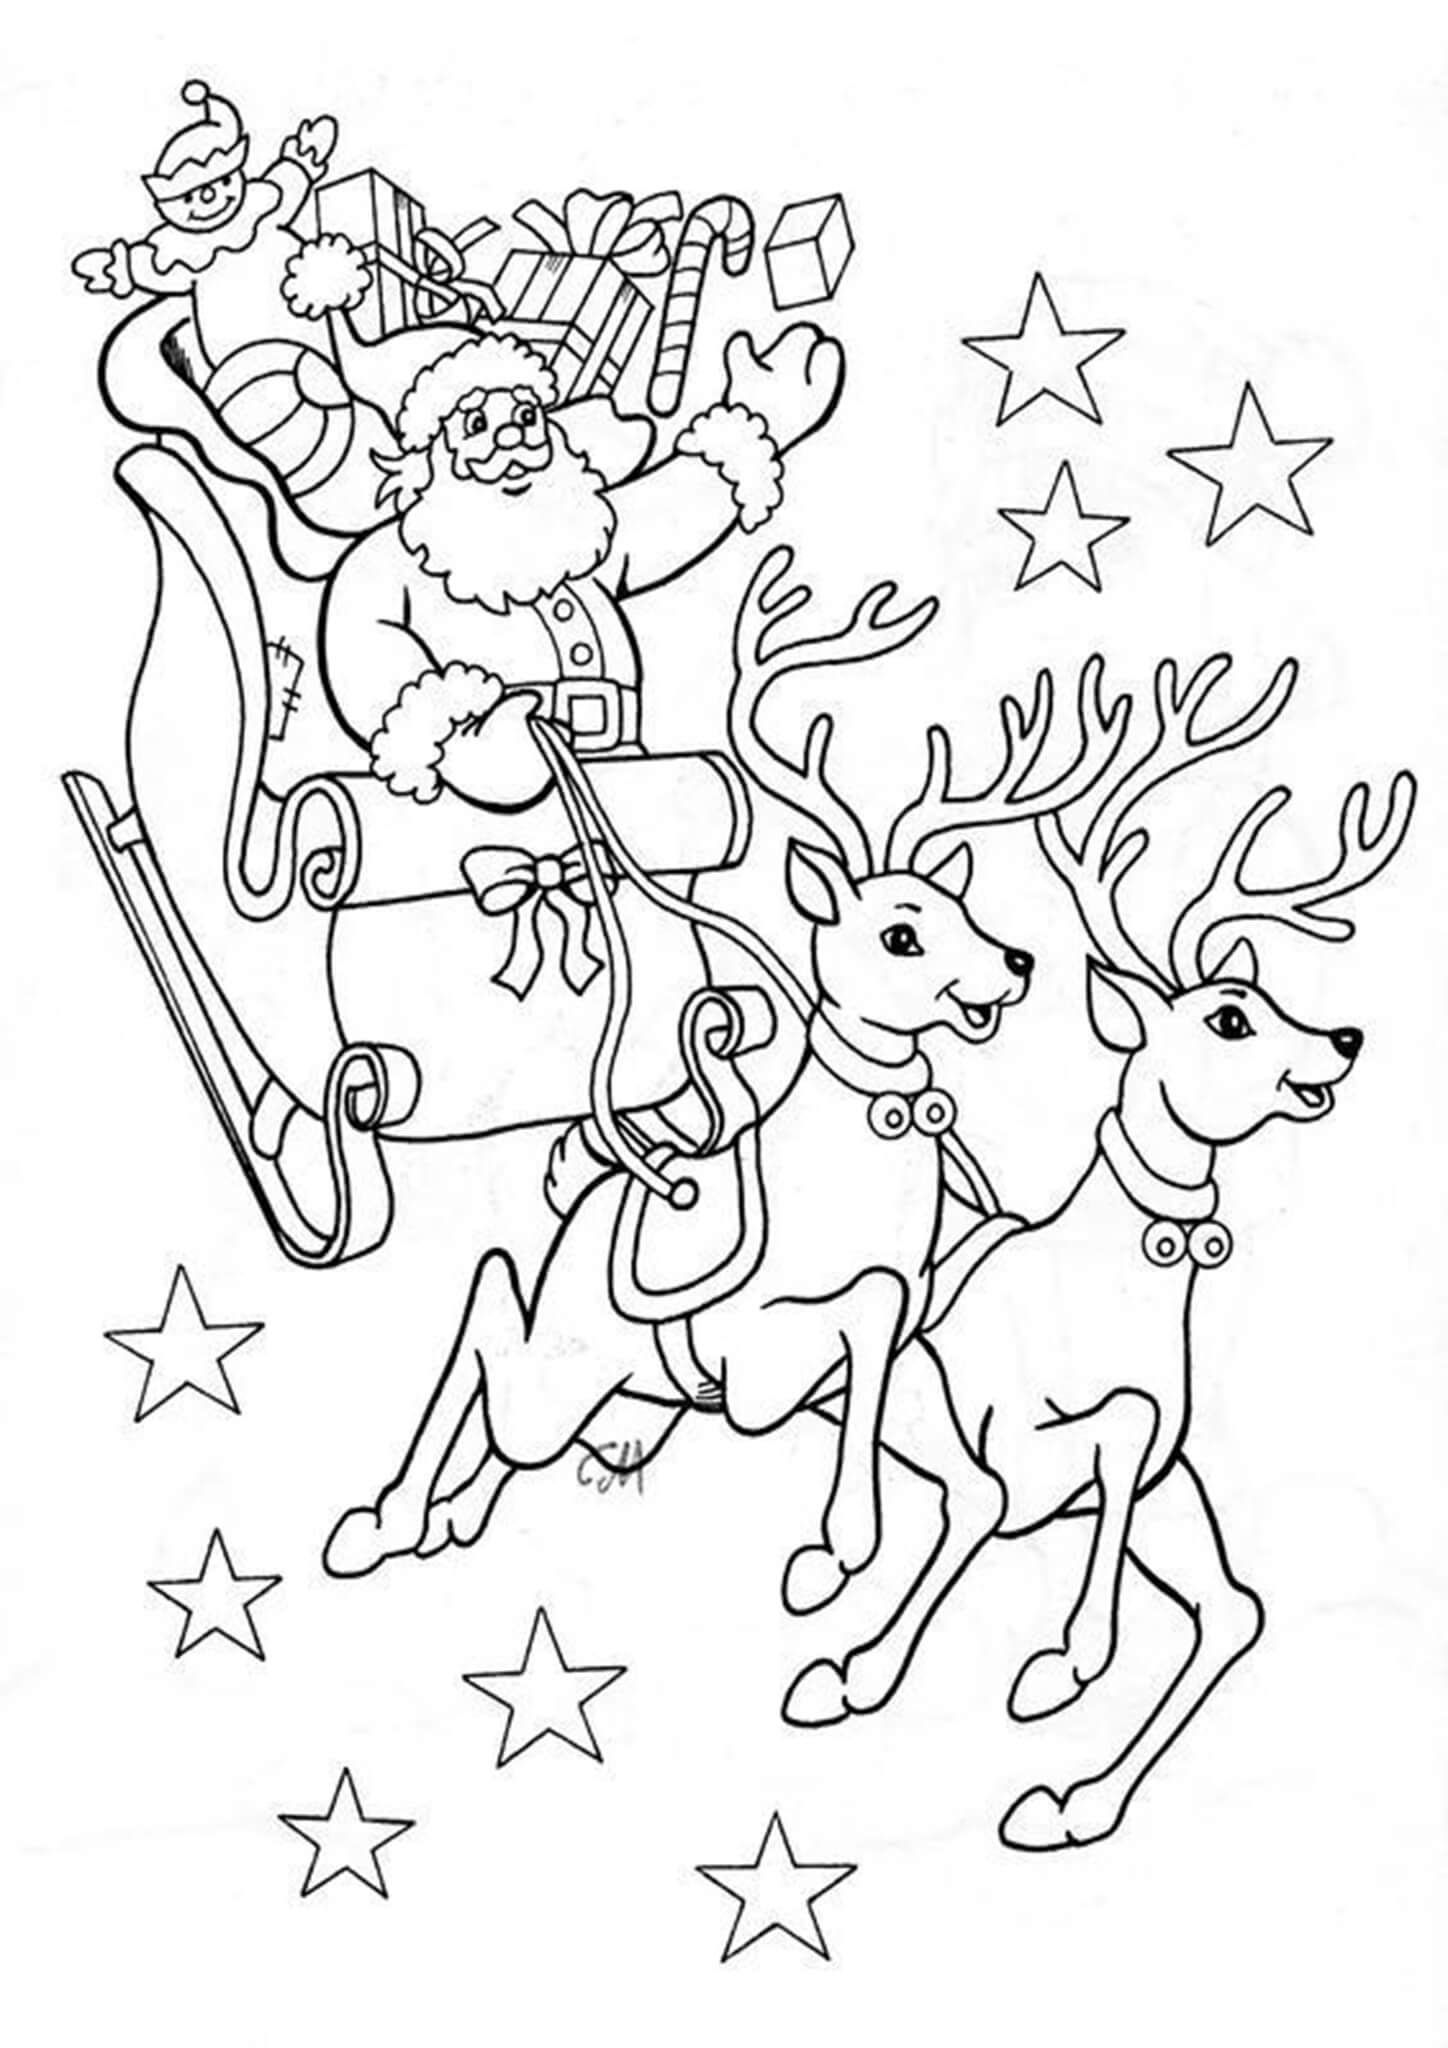 Free Printable Reindeer Coloring Pages Santa Coloring Pages Printable Christmas Coloring Pages Christmas Coloring Sheets